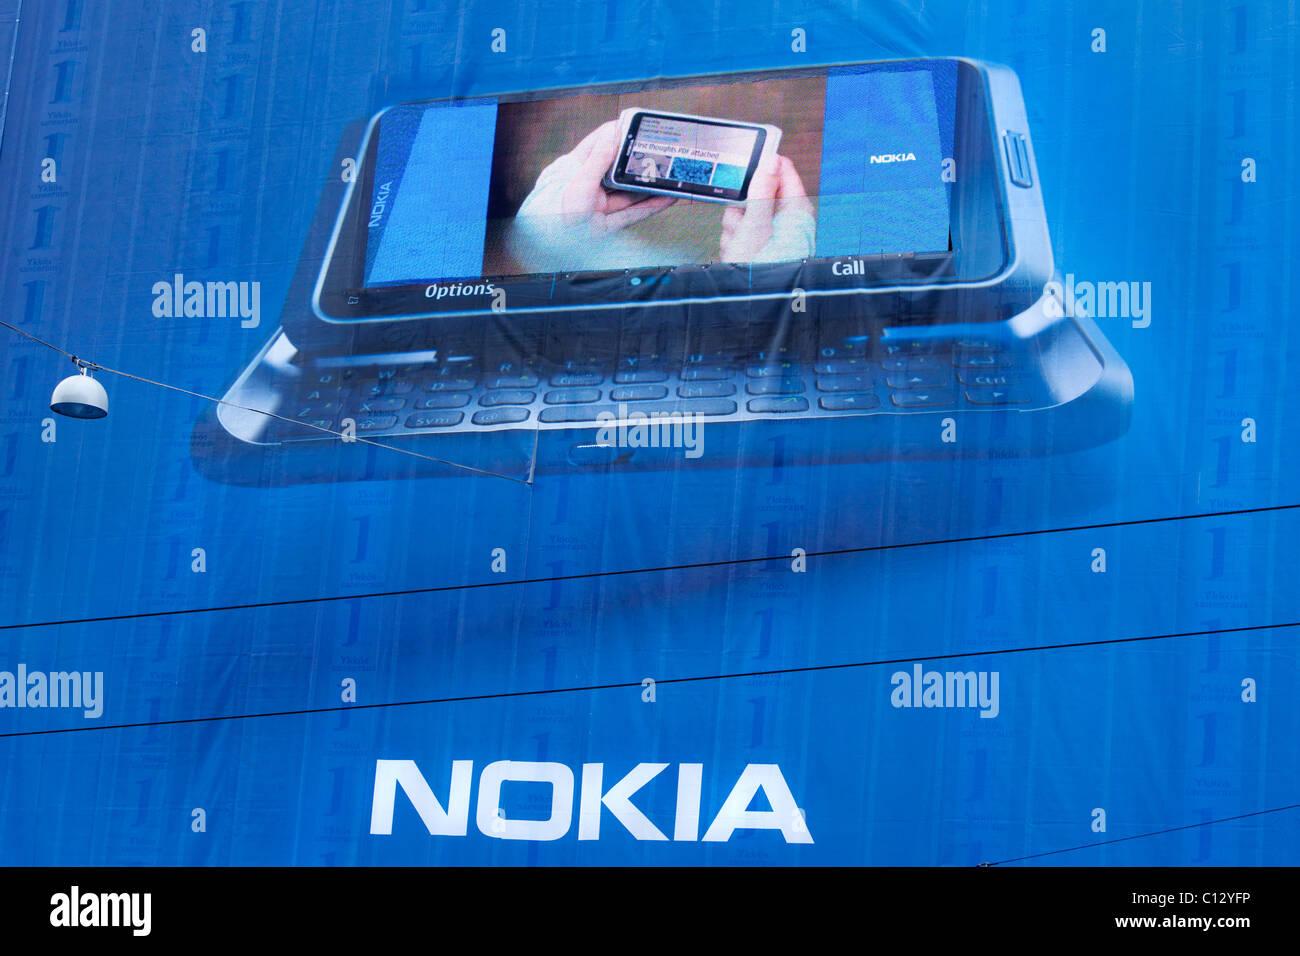 Nokia e7 - smartphone ad in Helsinki - Stock Image